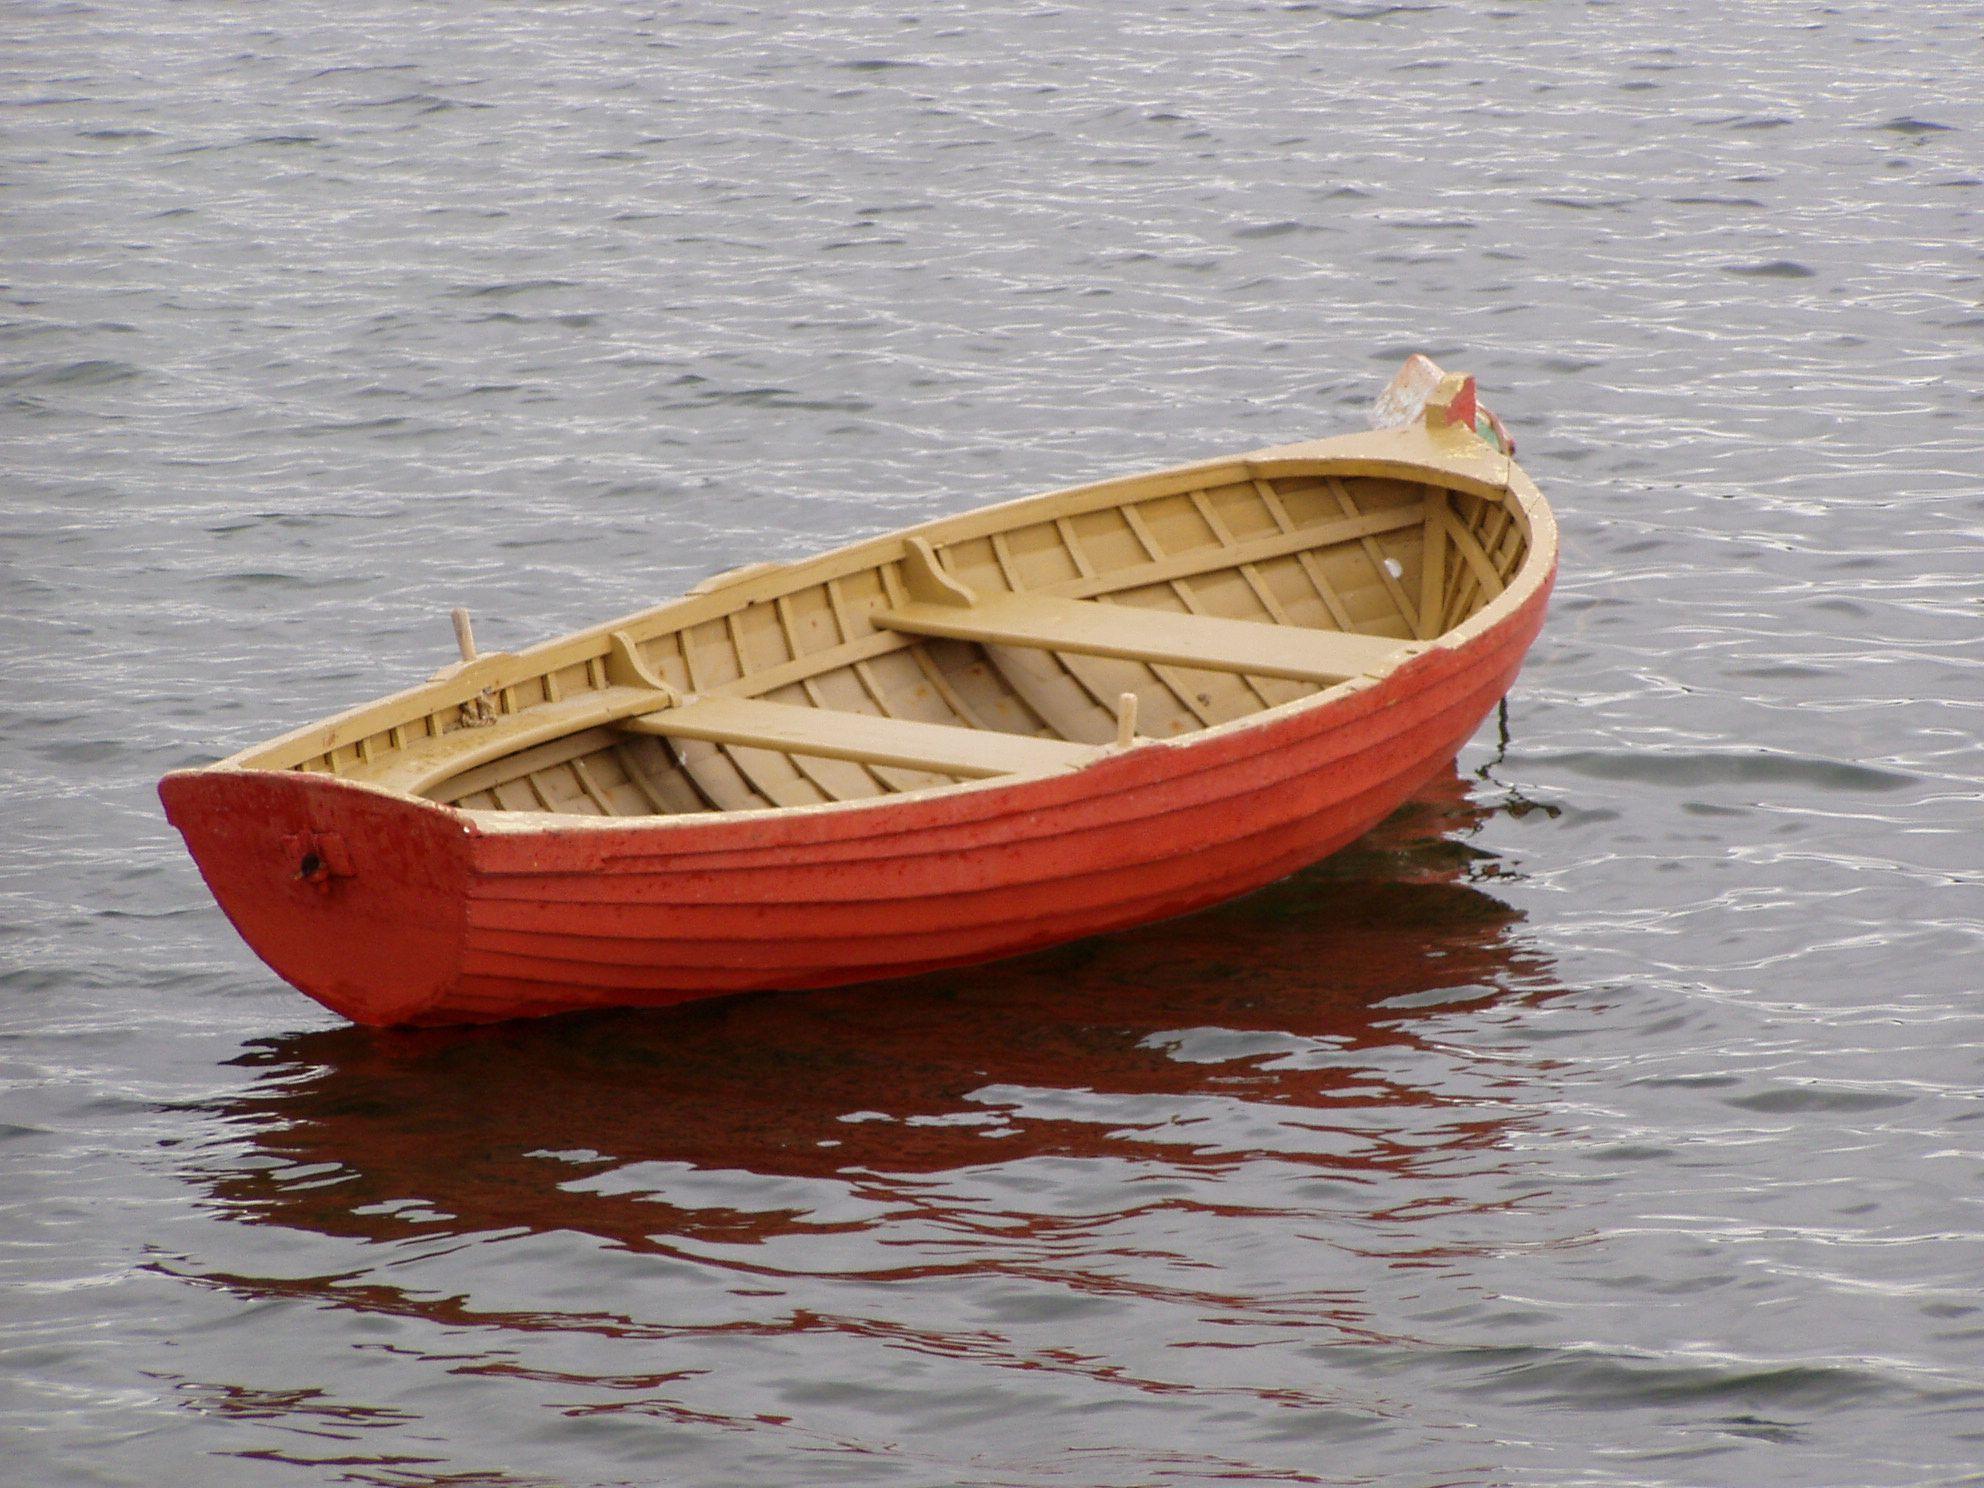 Little rowing boat photo